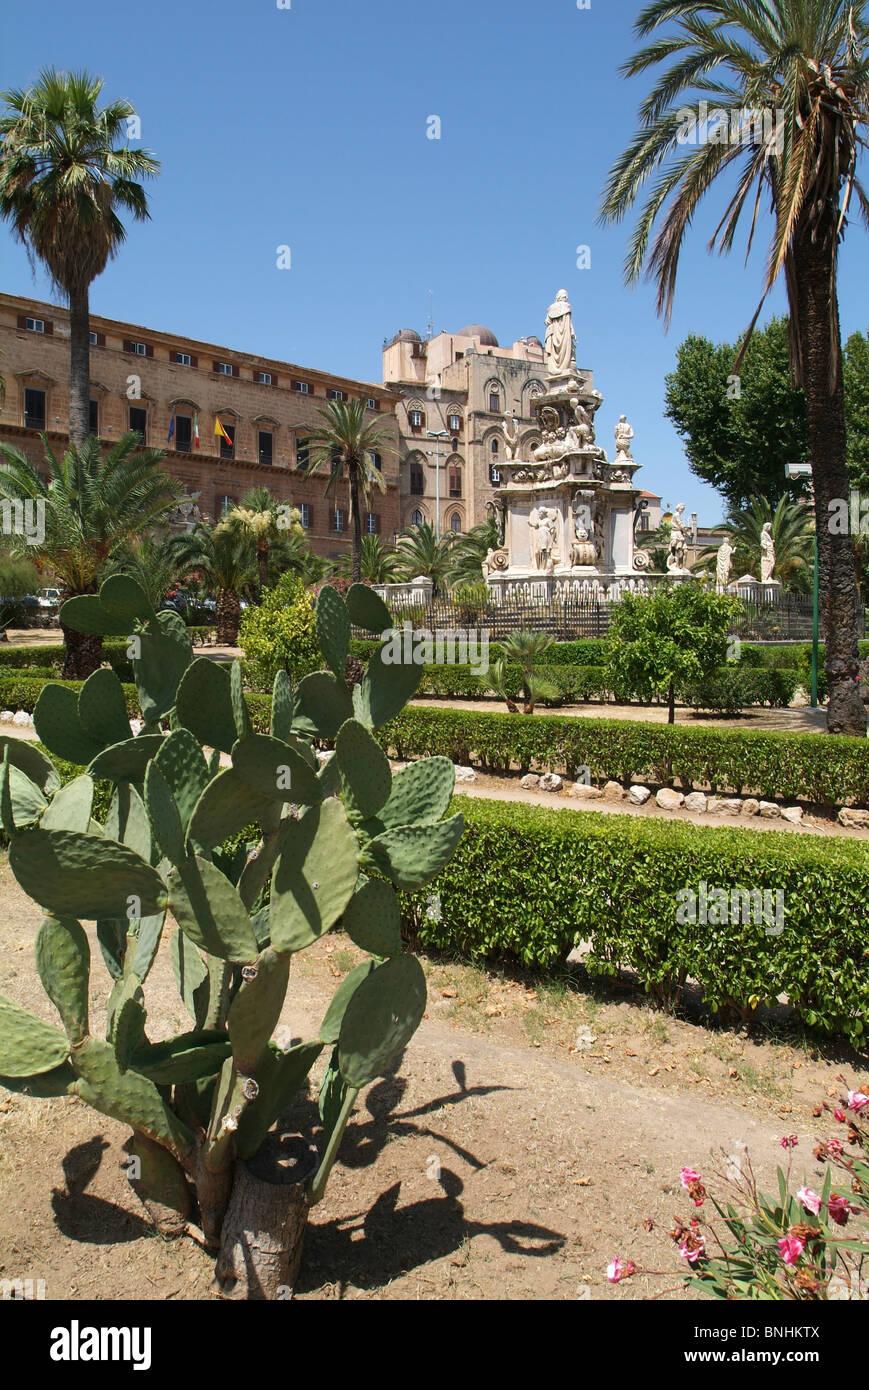 Italy Sicily Palermo city Palazzo dei Normanni palace garden park palm trees cacti Stock Photo